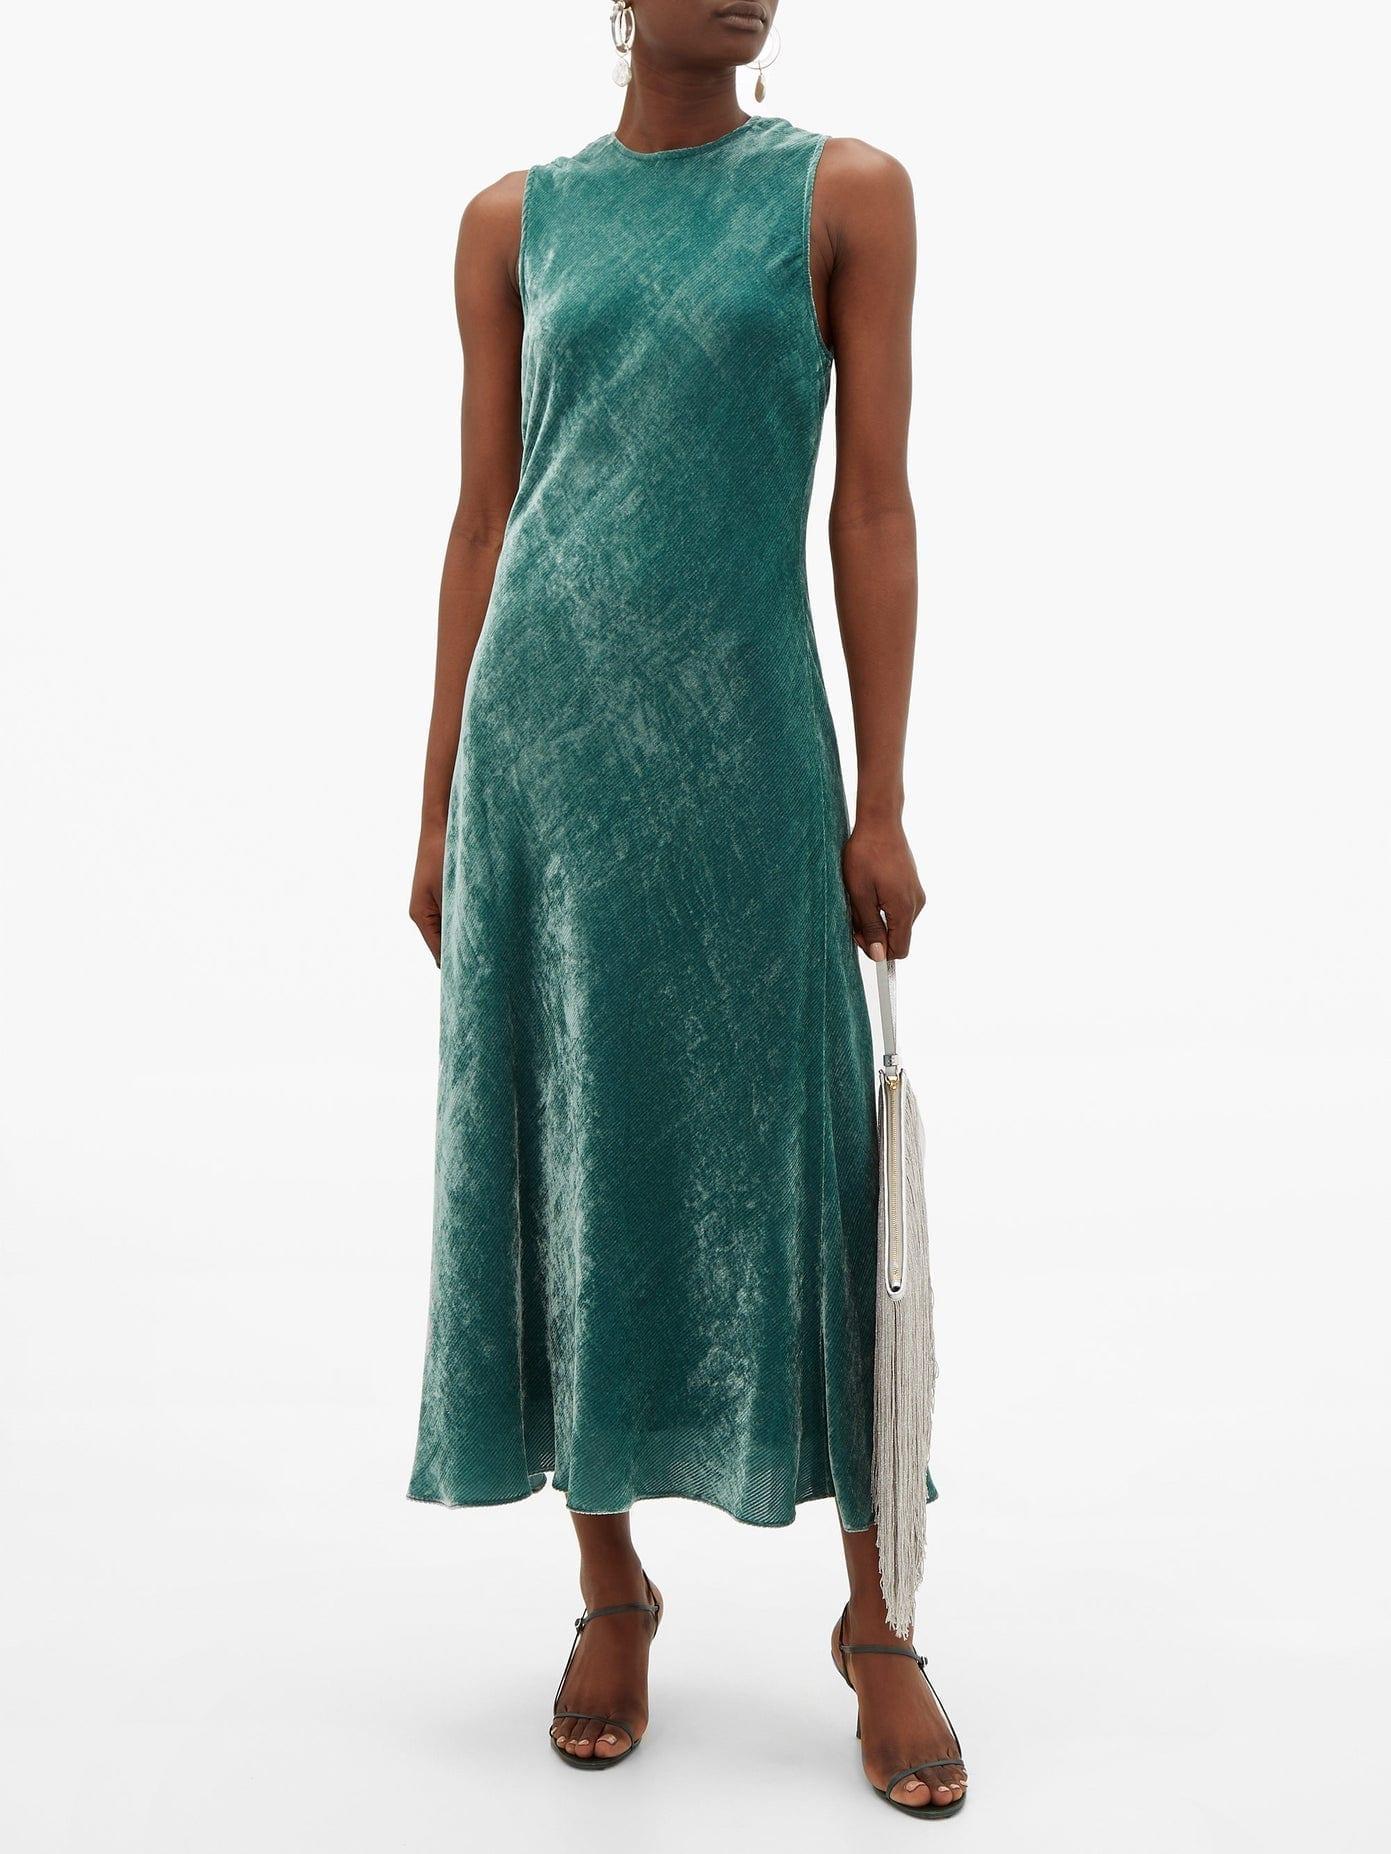 SIES MARJAN Viv Bias-Cut Corduroy-Velvet Dress